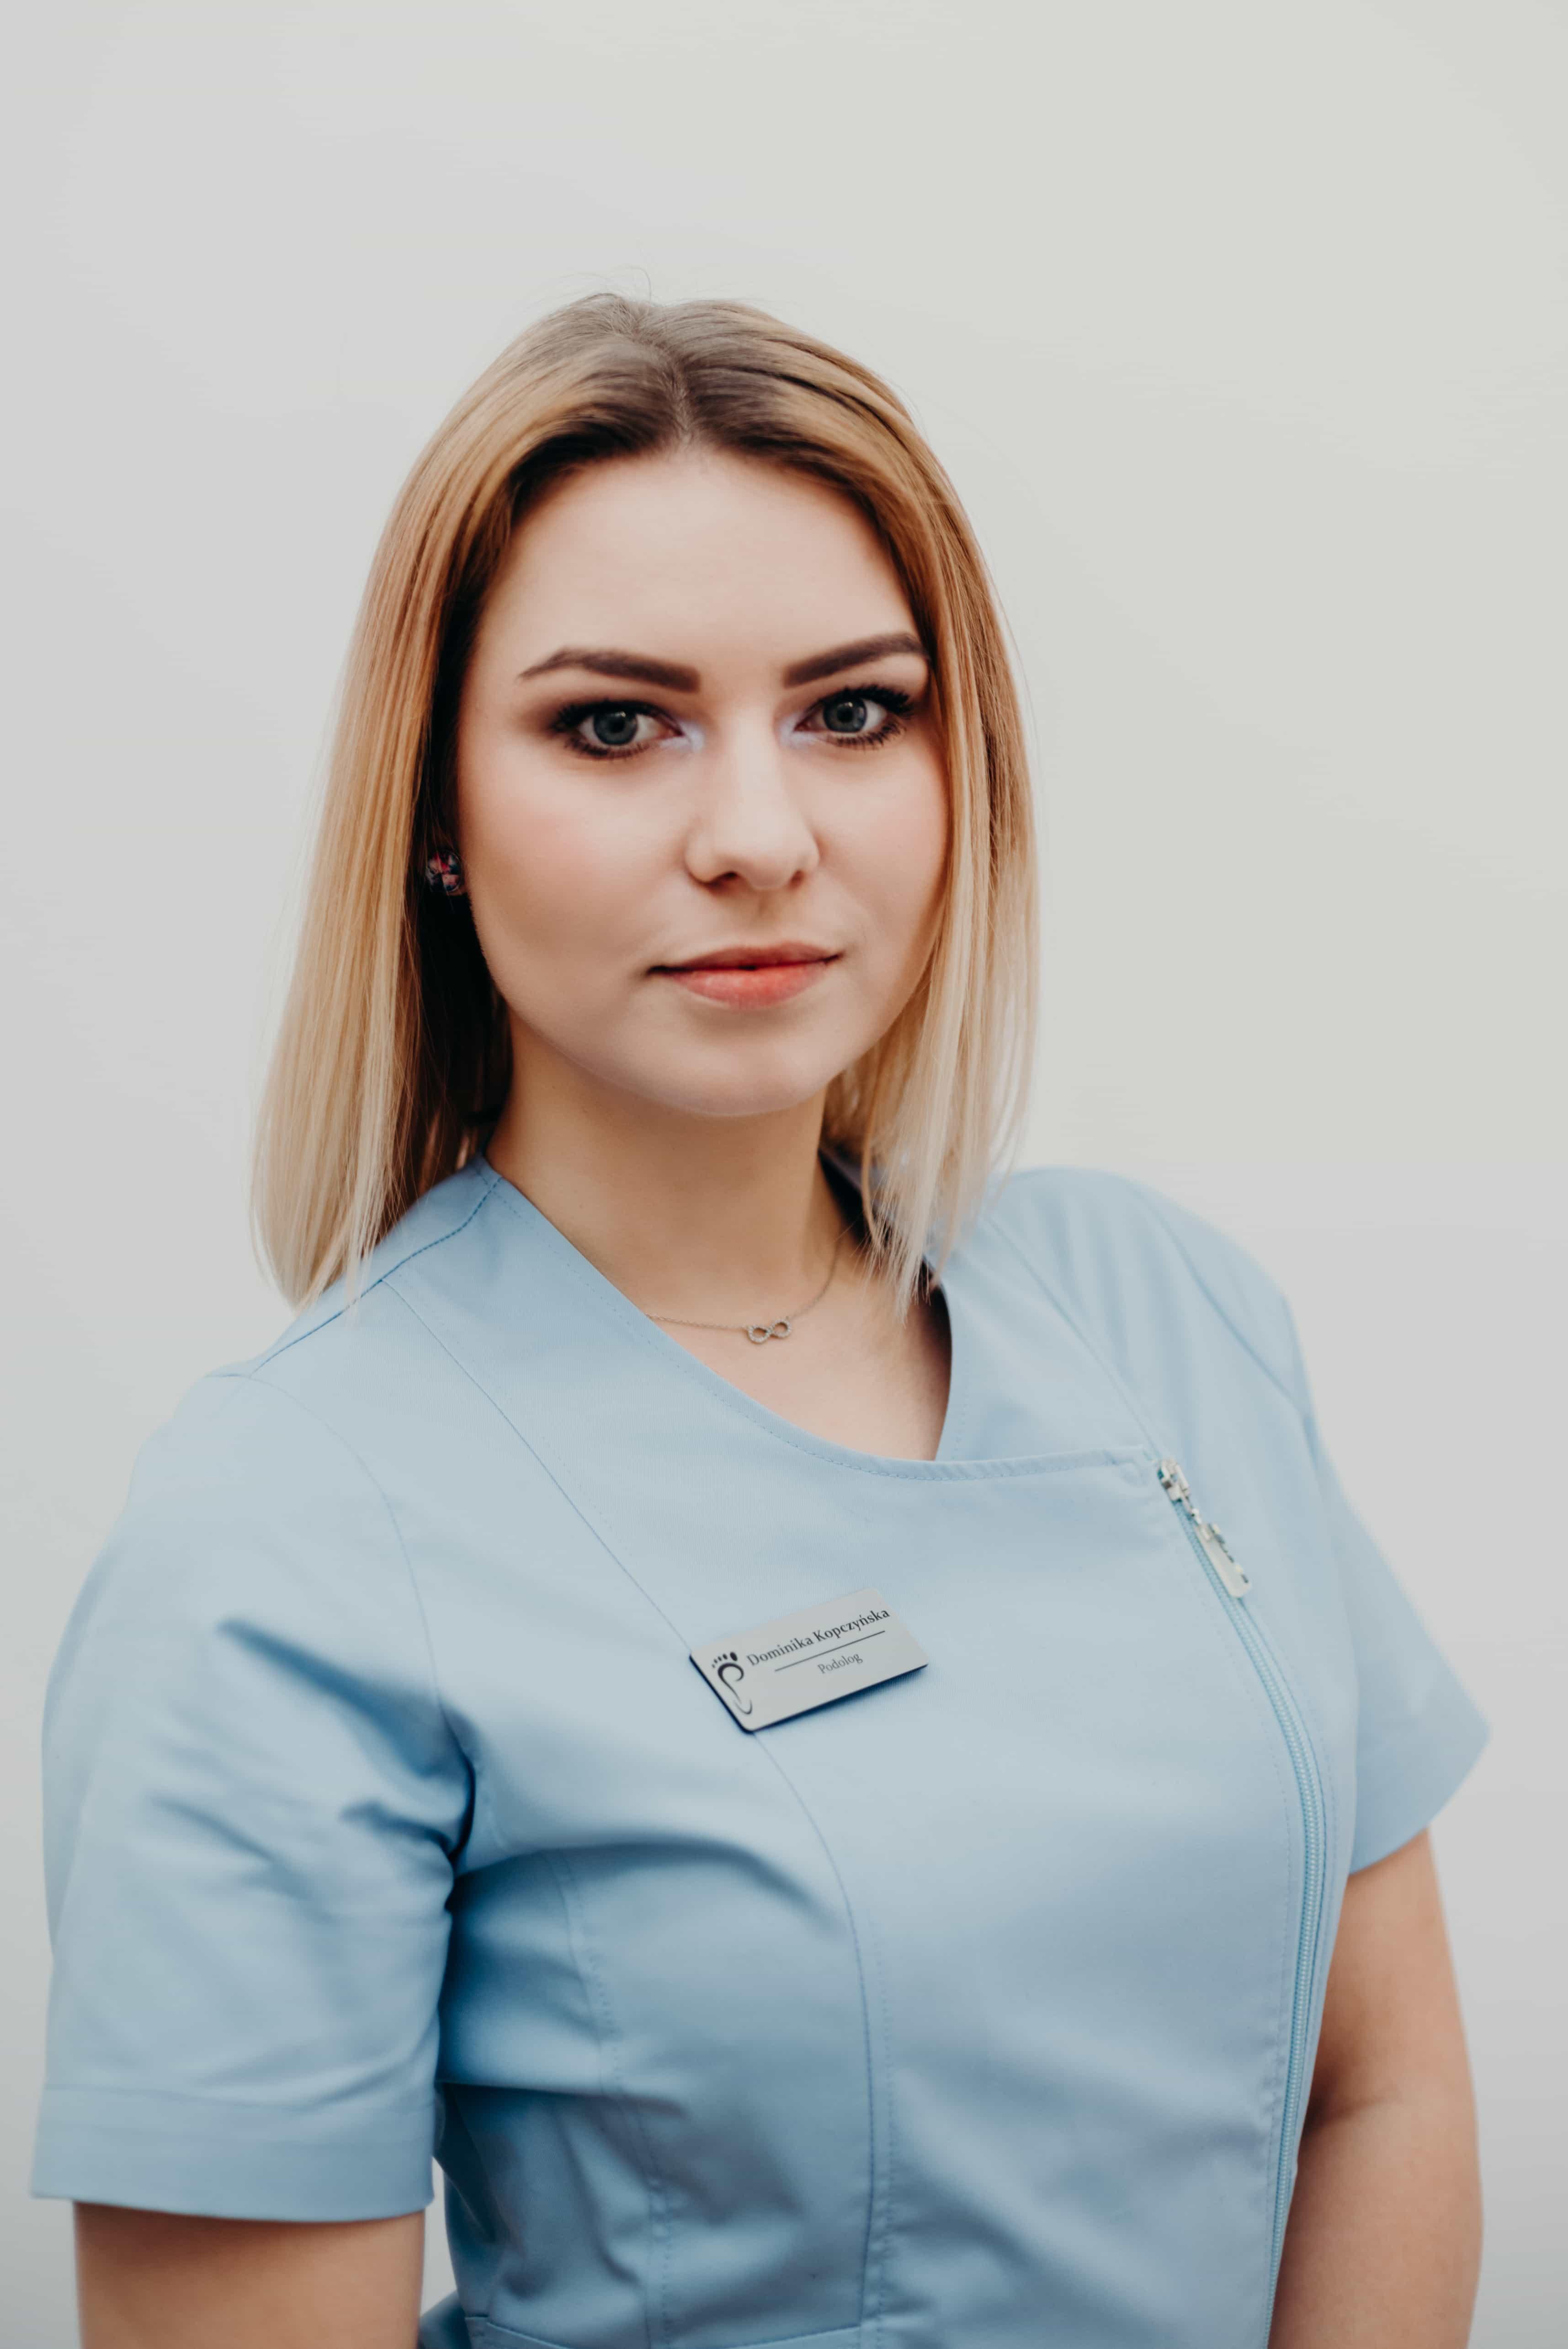 Specjalista-podolog mgr Dominika Kopczyńska